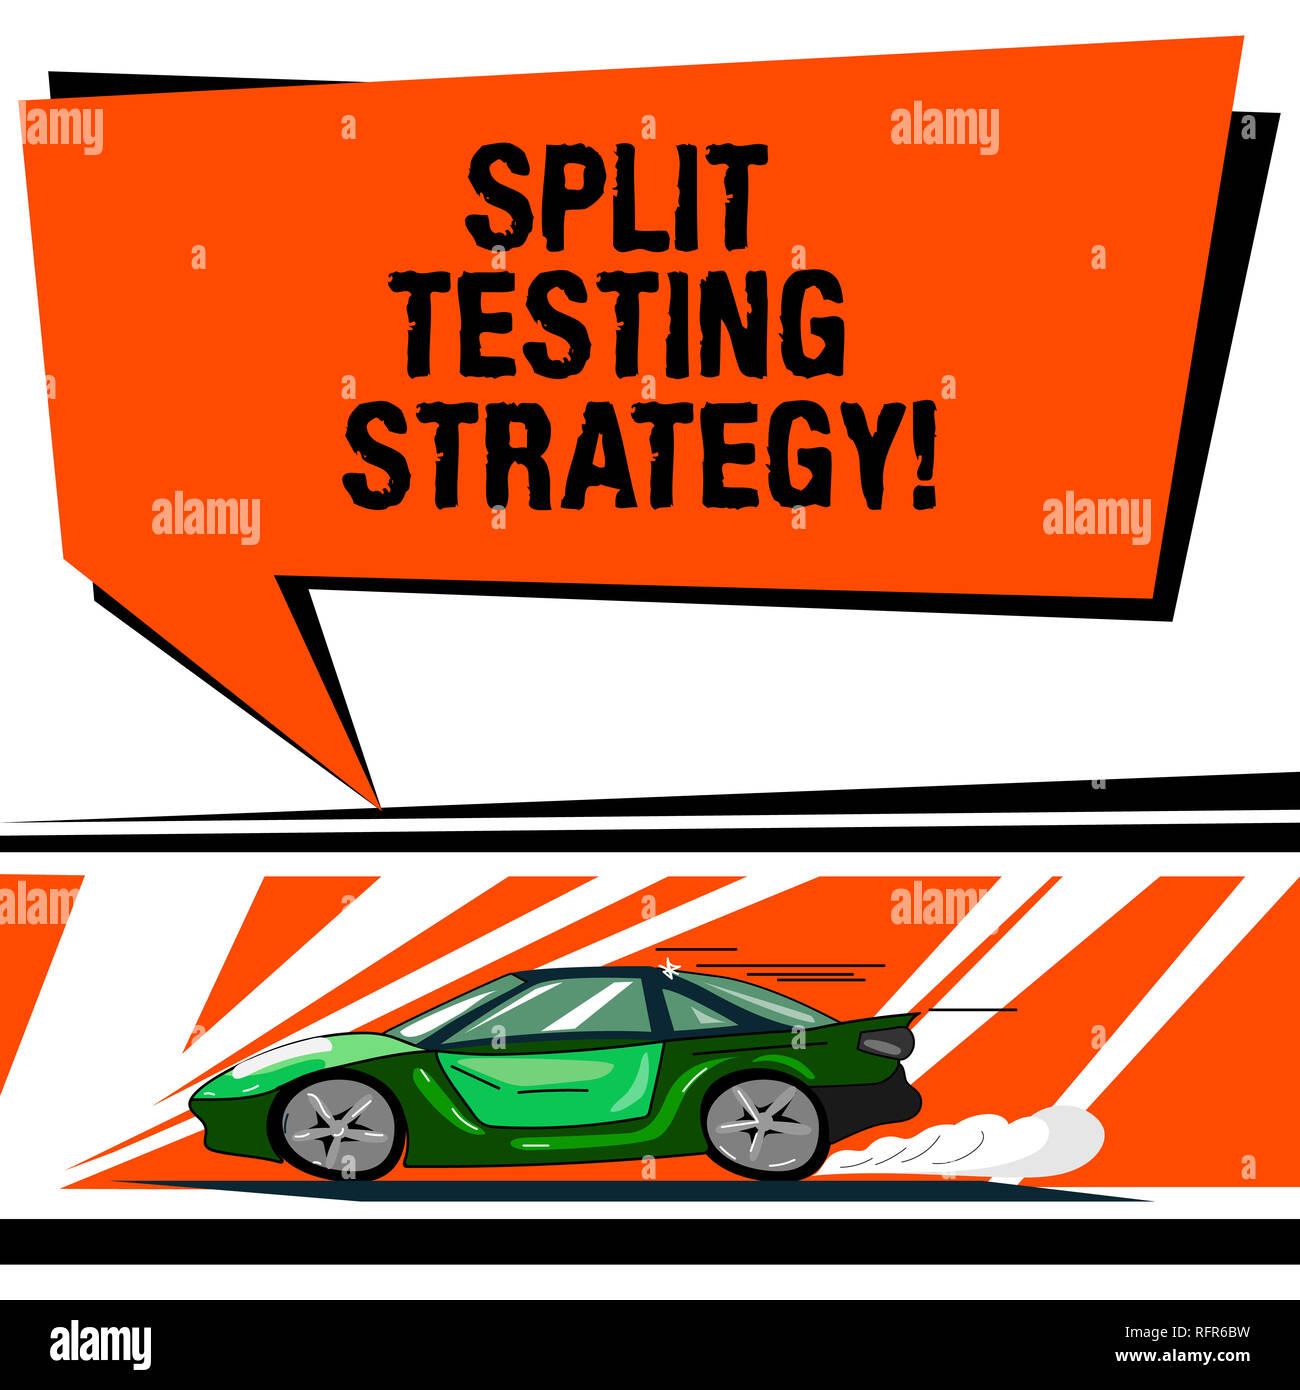 Isometric Car Stock Photos & Isometric Car Stock Images - Alamy